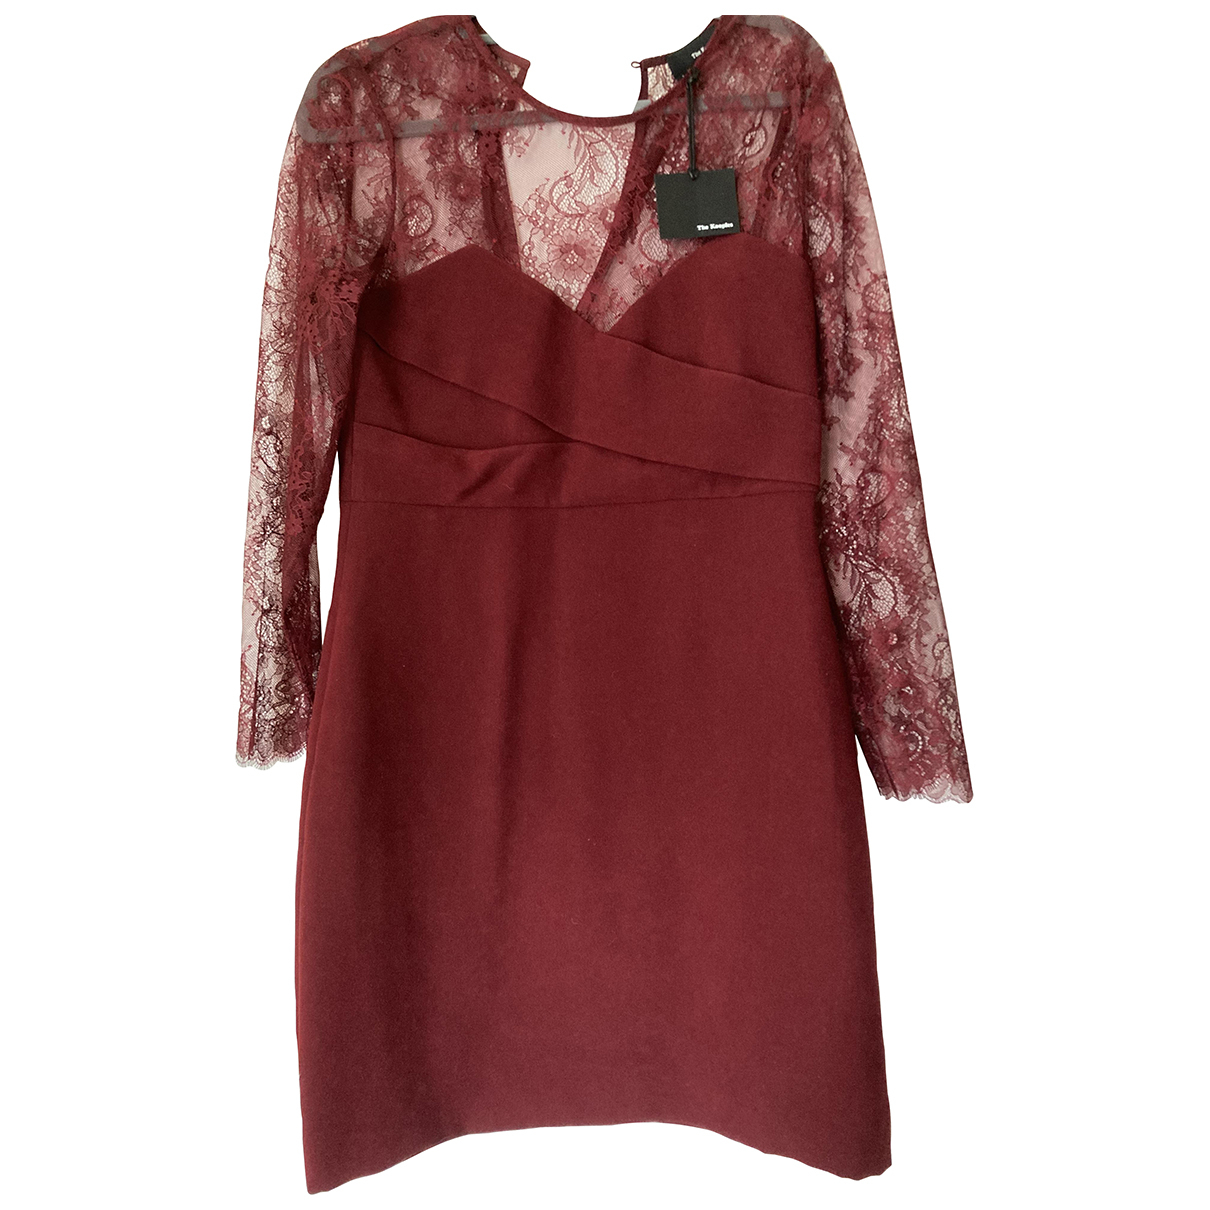 The Kooples \N Burgundy Lace dress for Women 40 FR